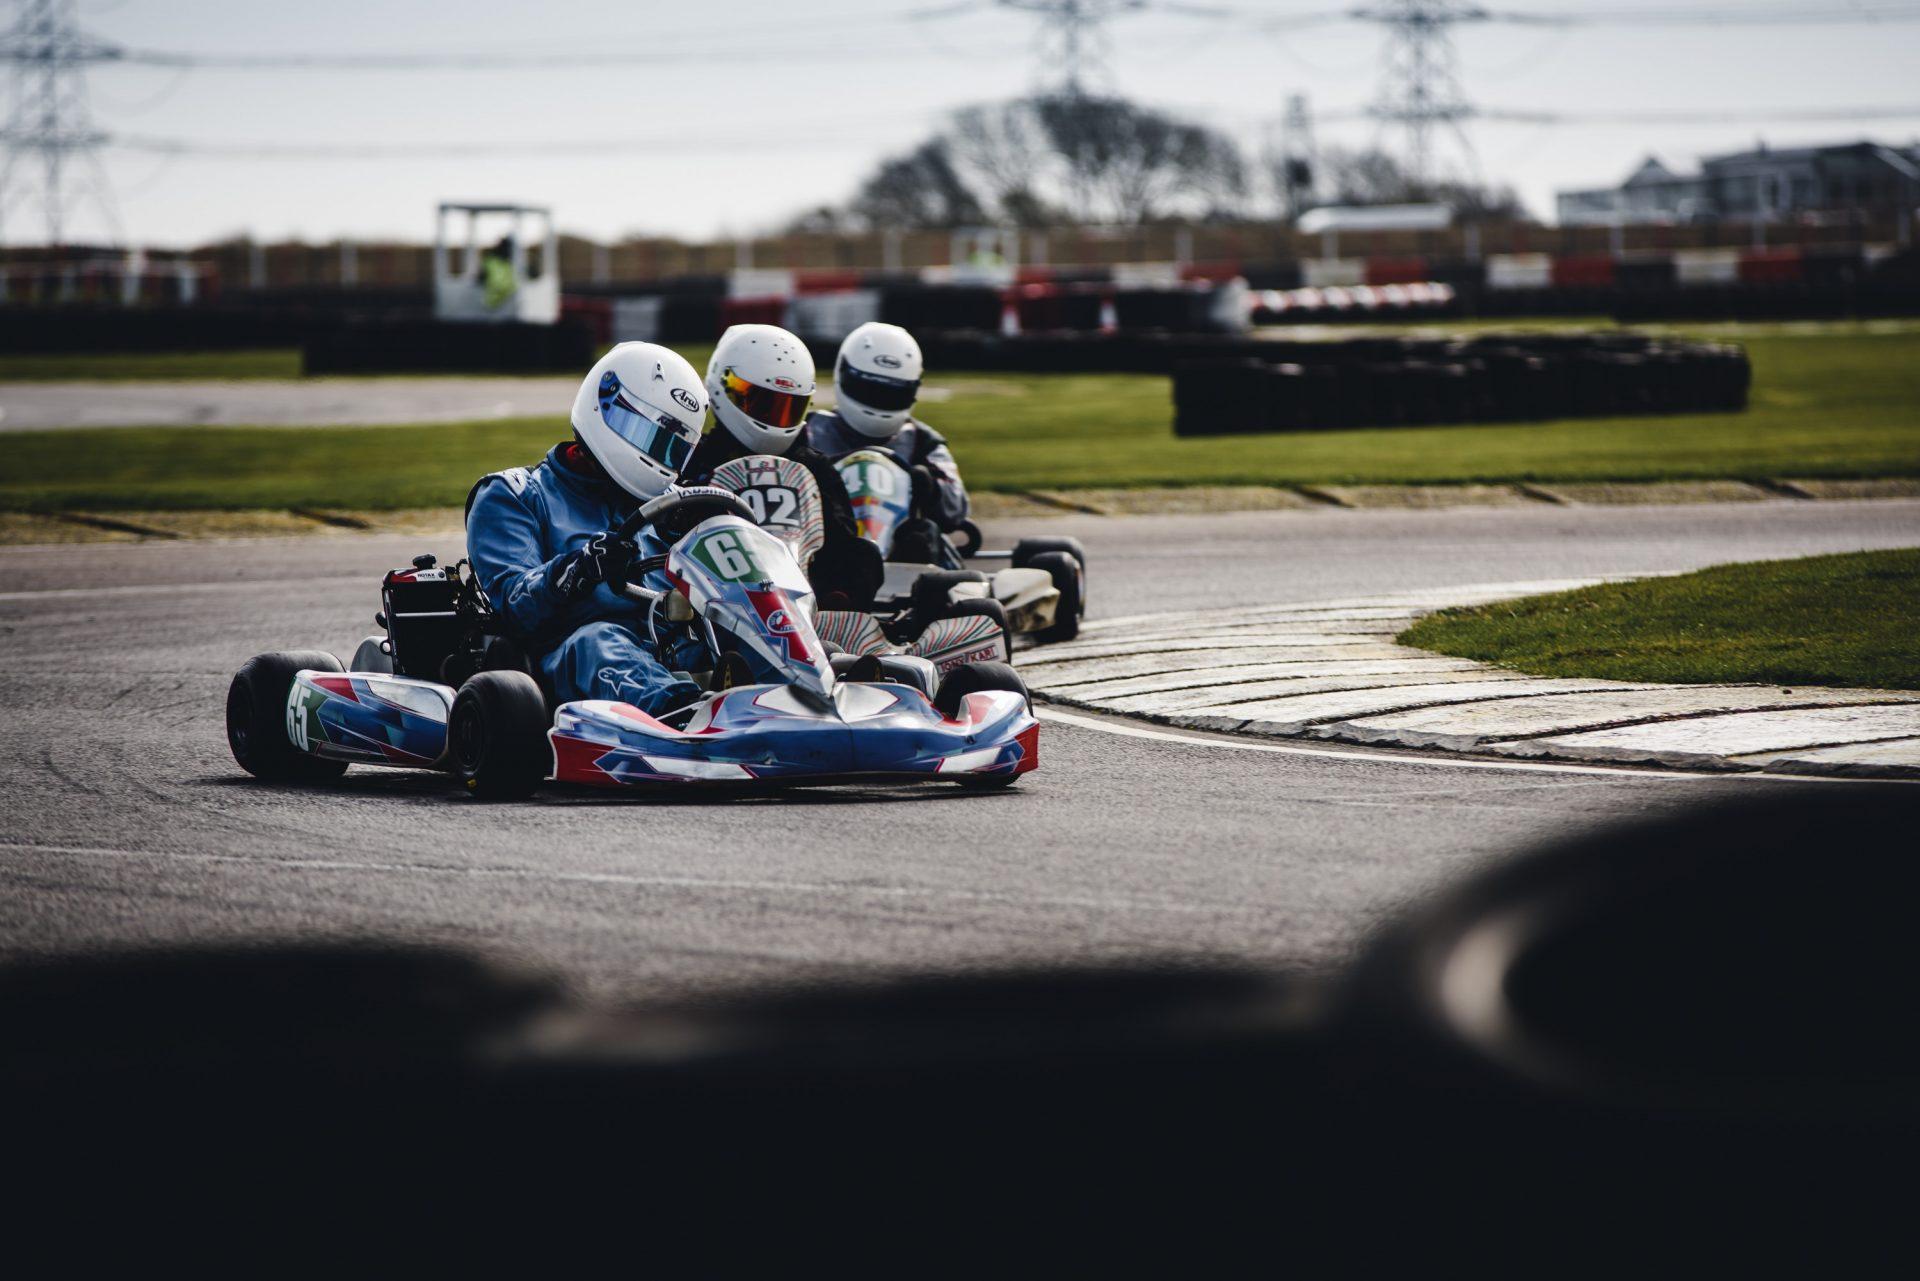 5 Ways to Get Into Racing as an Amateur